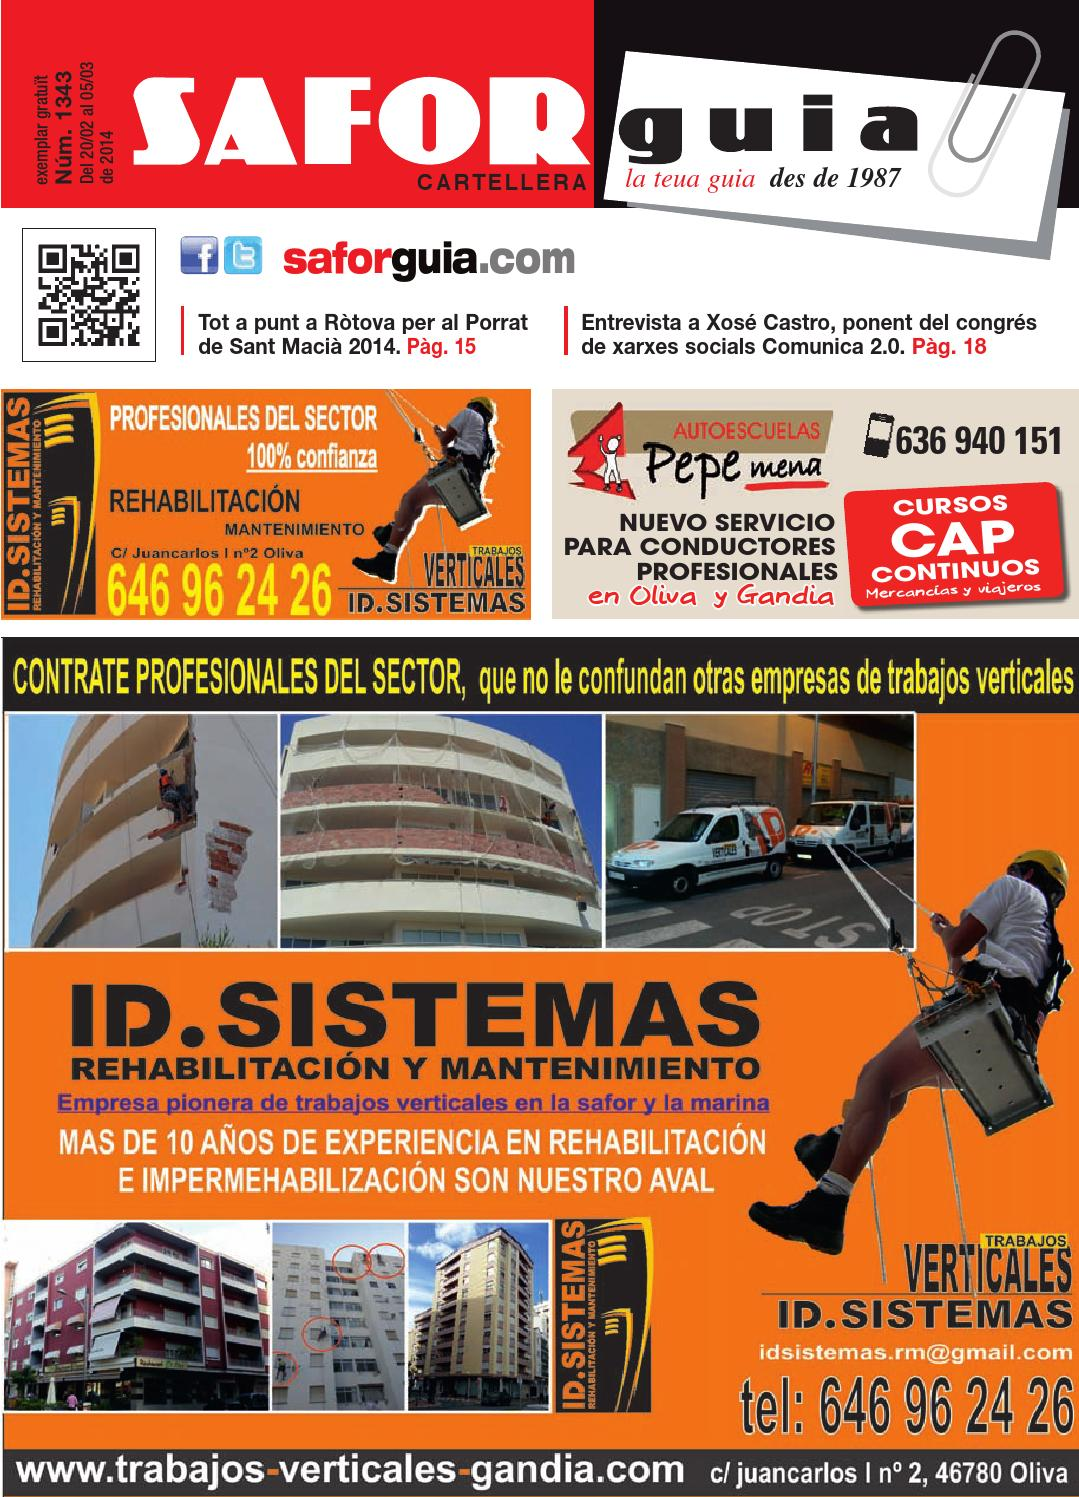 Publicaci N Del 20 De Febrero Al 5 De Marzo De 2014 By Saforguia  # Muebles Peiro Quart De Poblet